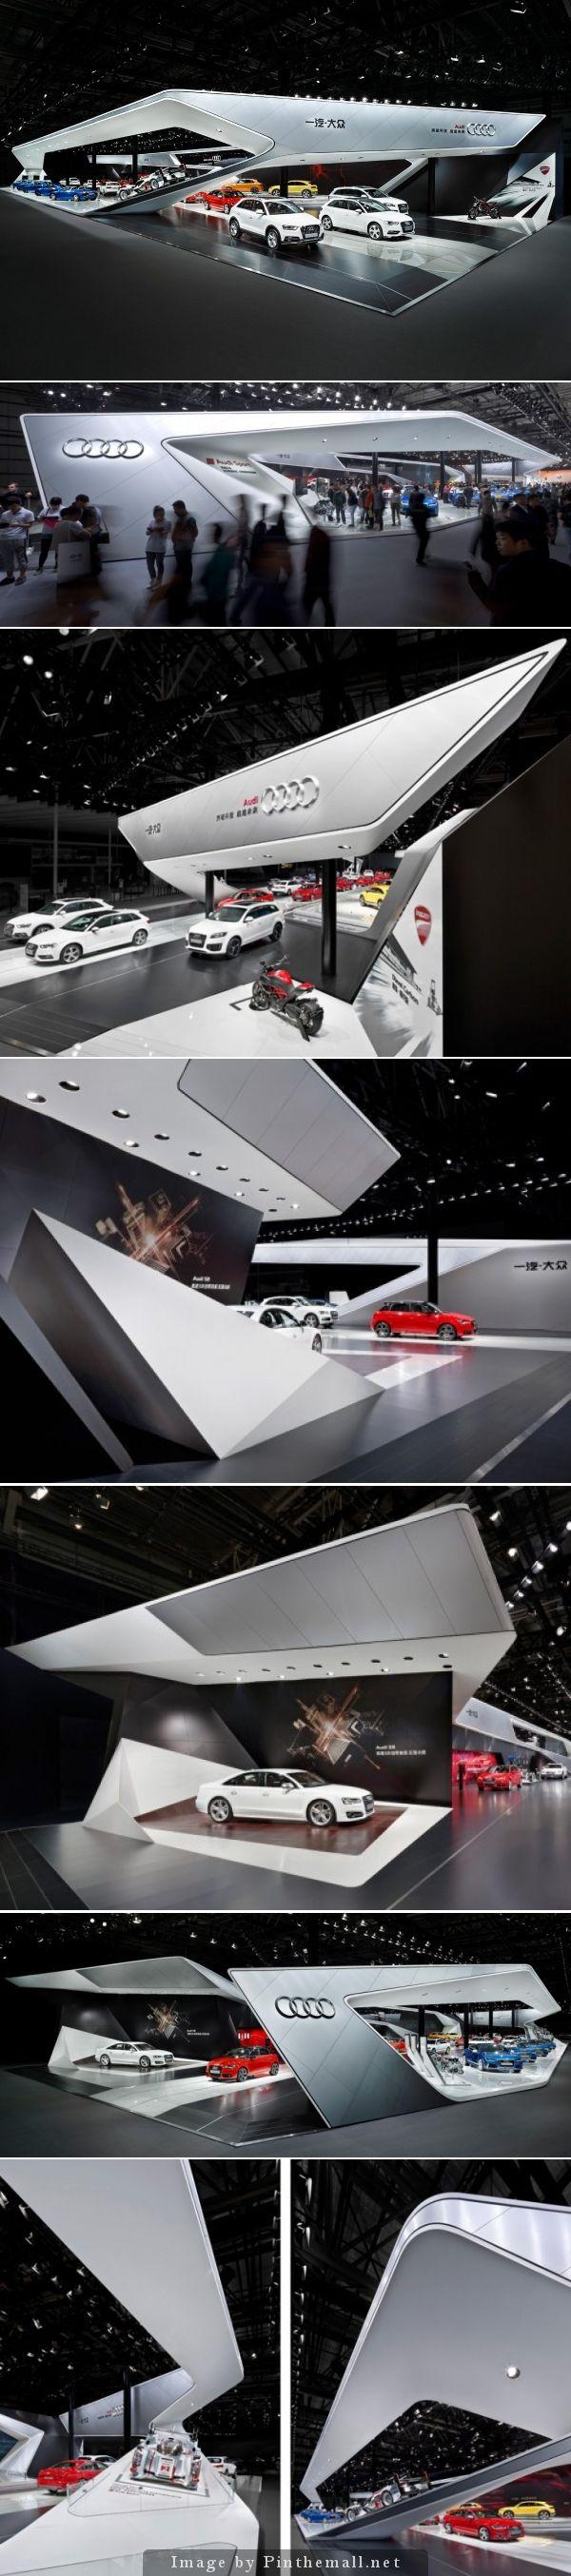 Audi exhibition design Auto China 2014 schmidhuber.de schmidhuber and partner - created via http://pinthemall.net